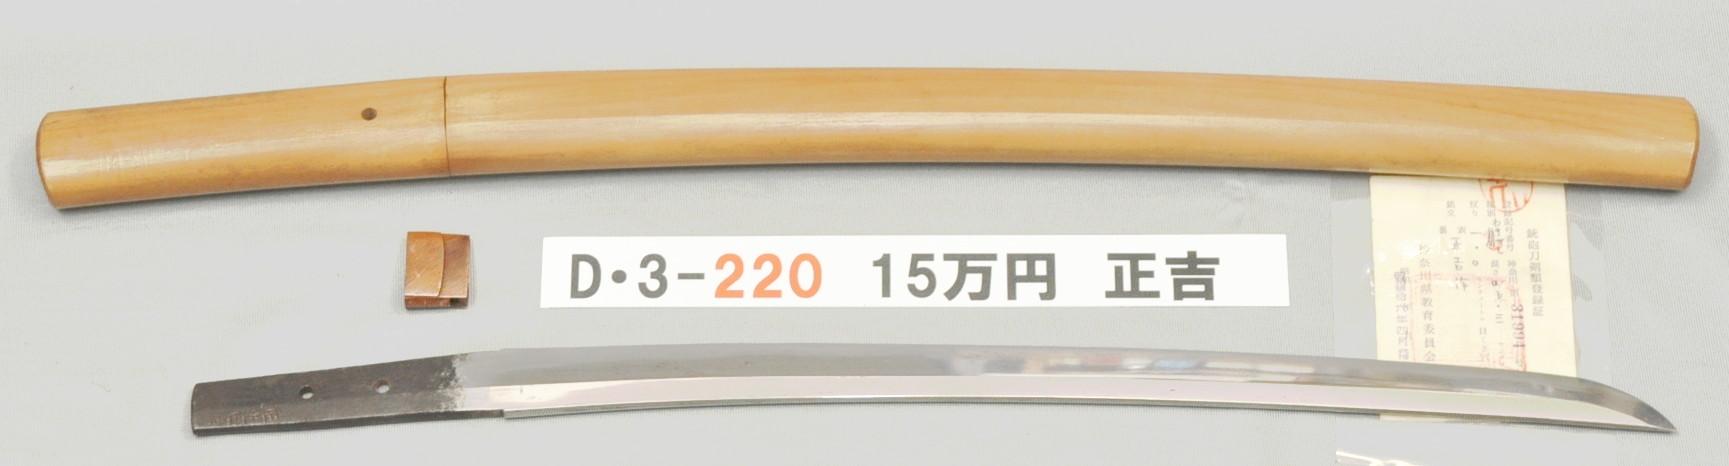 D3220